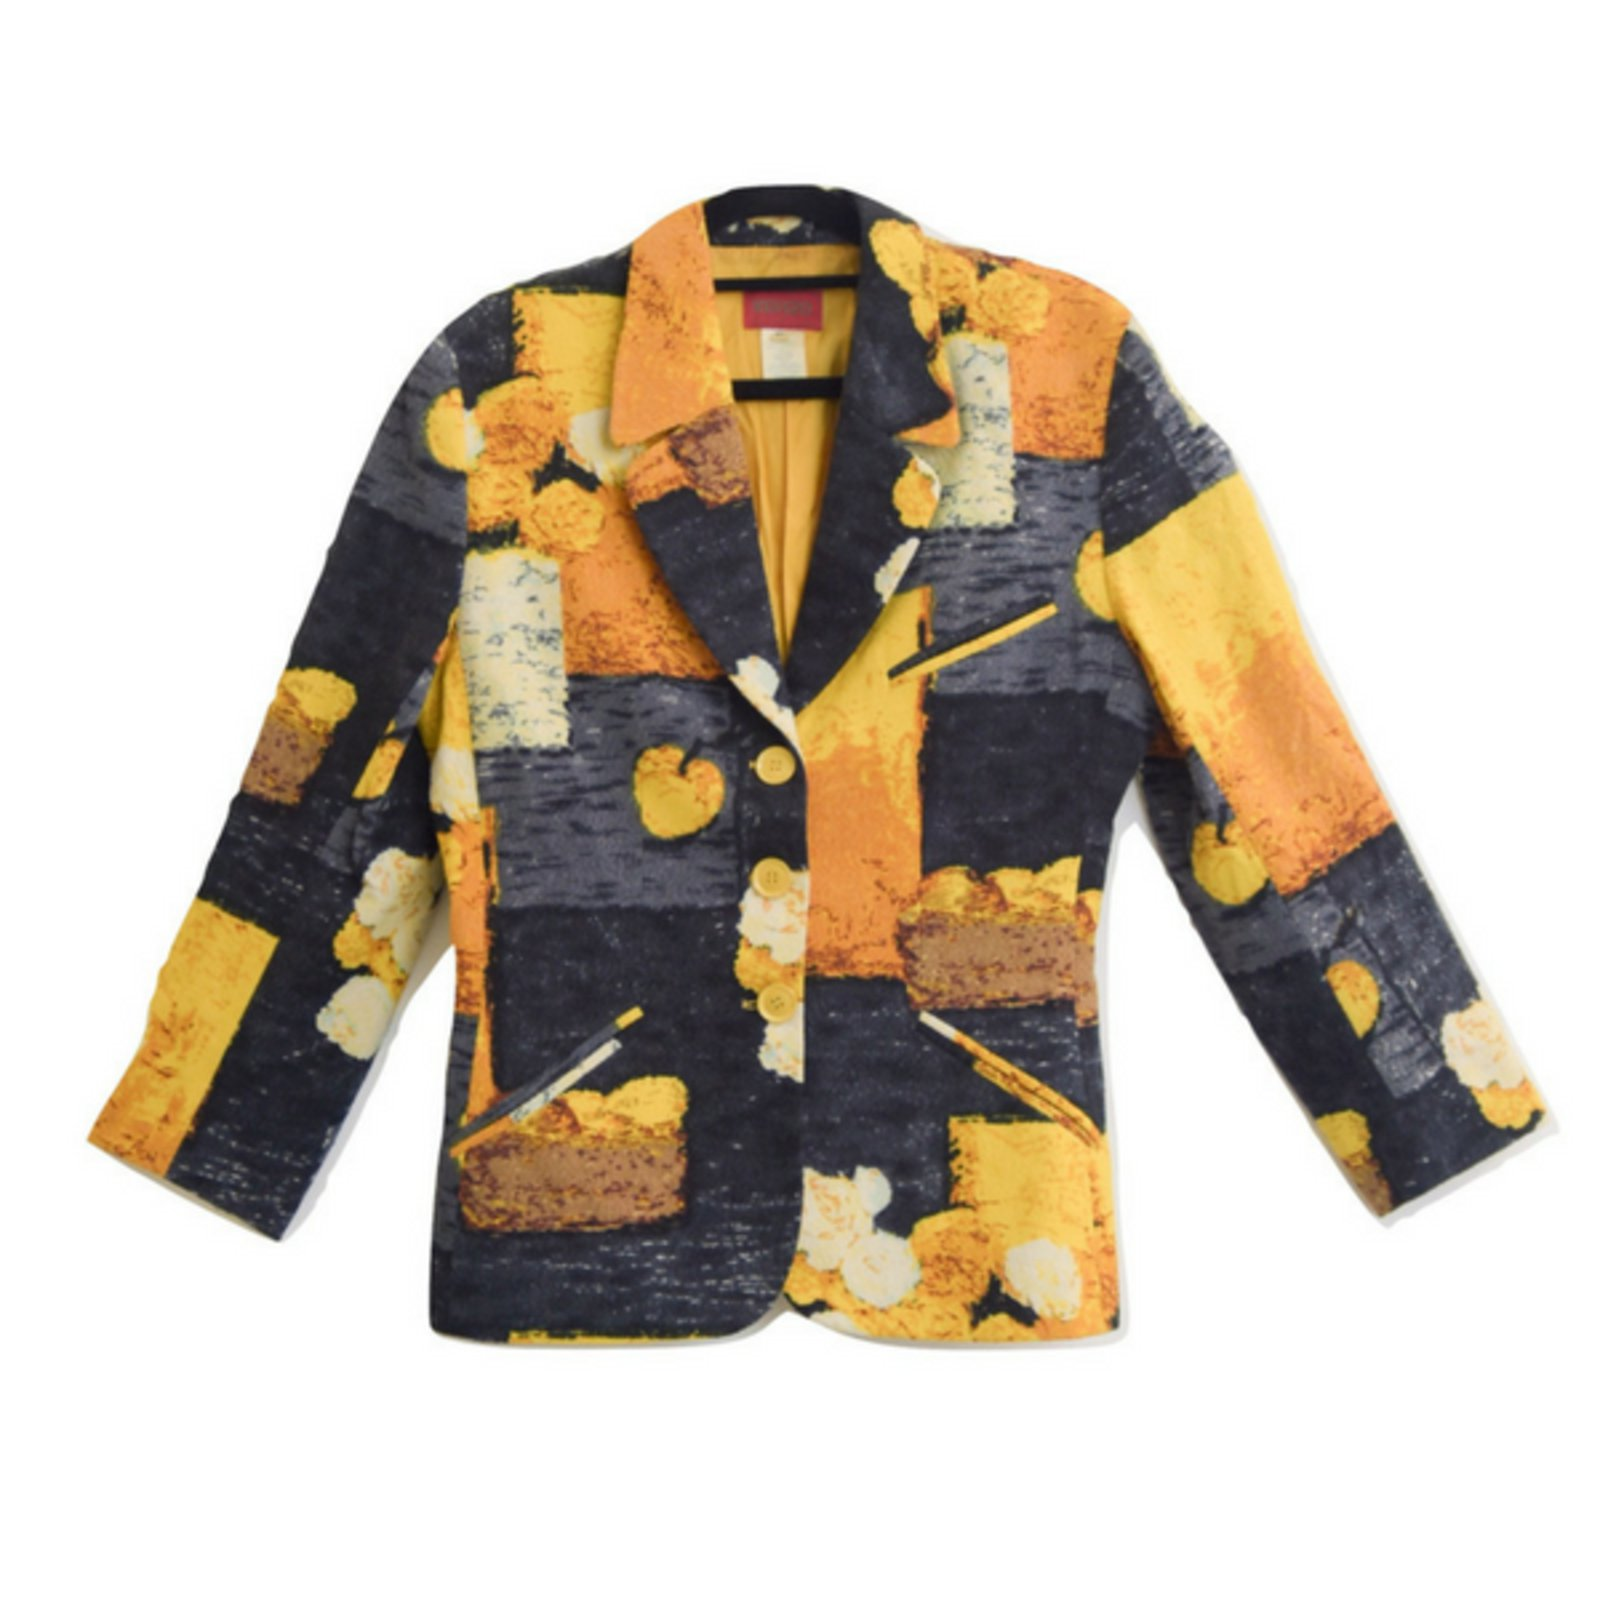 vestes kenzo veste laine noir multicolore jaune joli closet. Black Bedroom Furniture Sets. Home Design Ideas